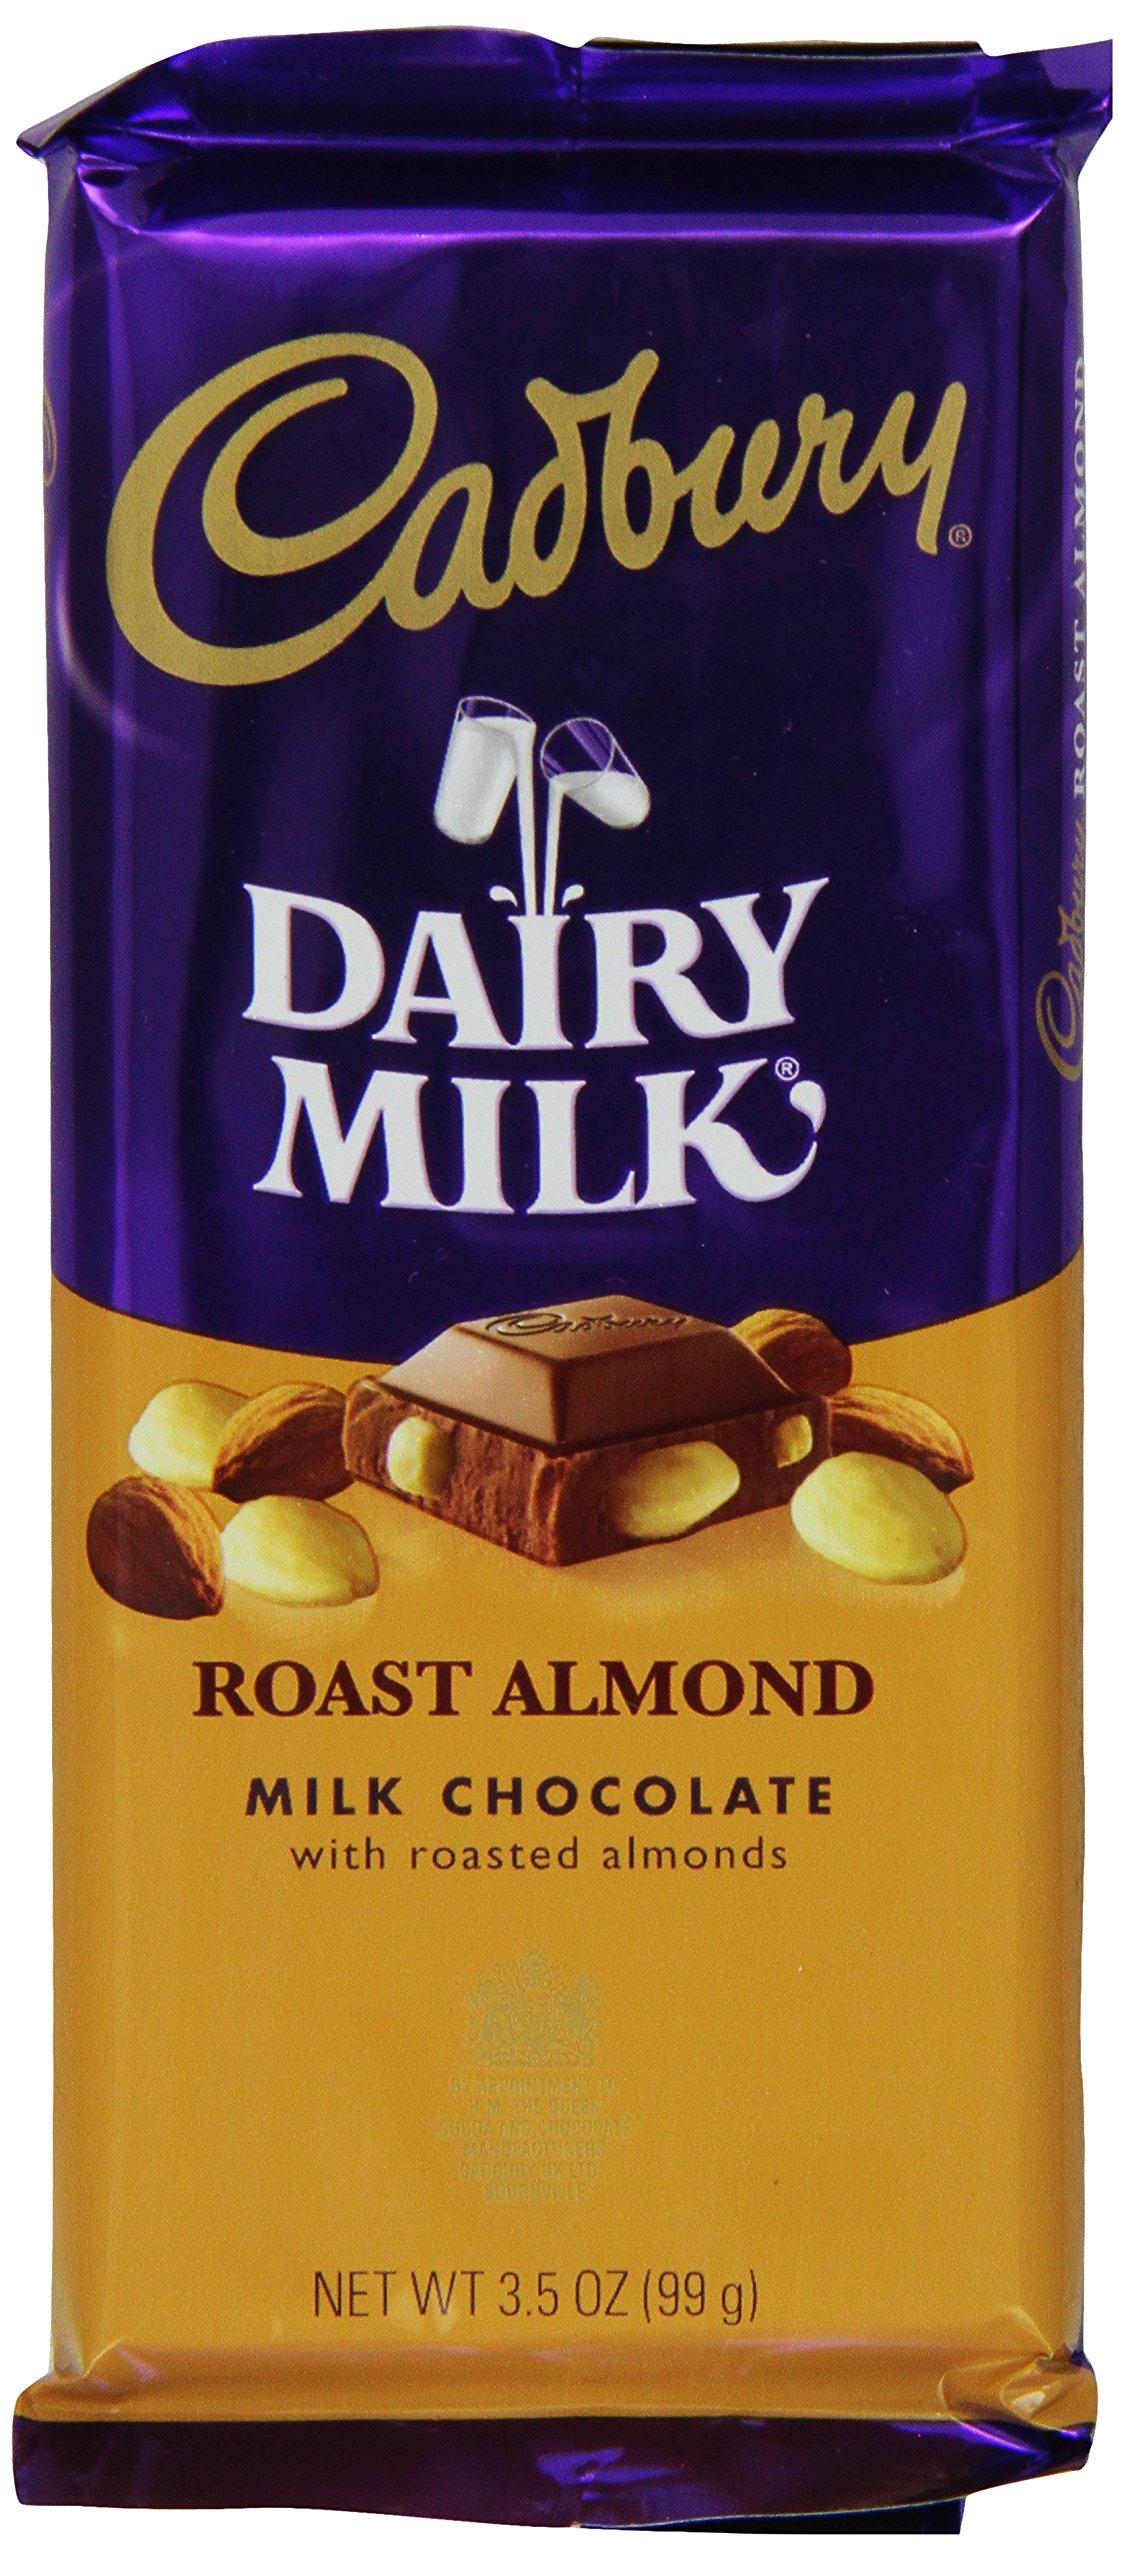 CADBURY DAIRY MILK Roast Almond Milk Chocolate Bar, 3.5 Ounce